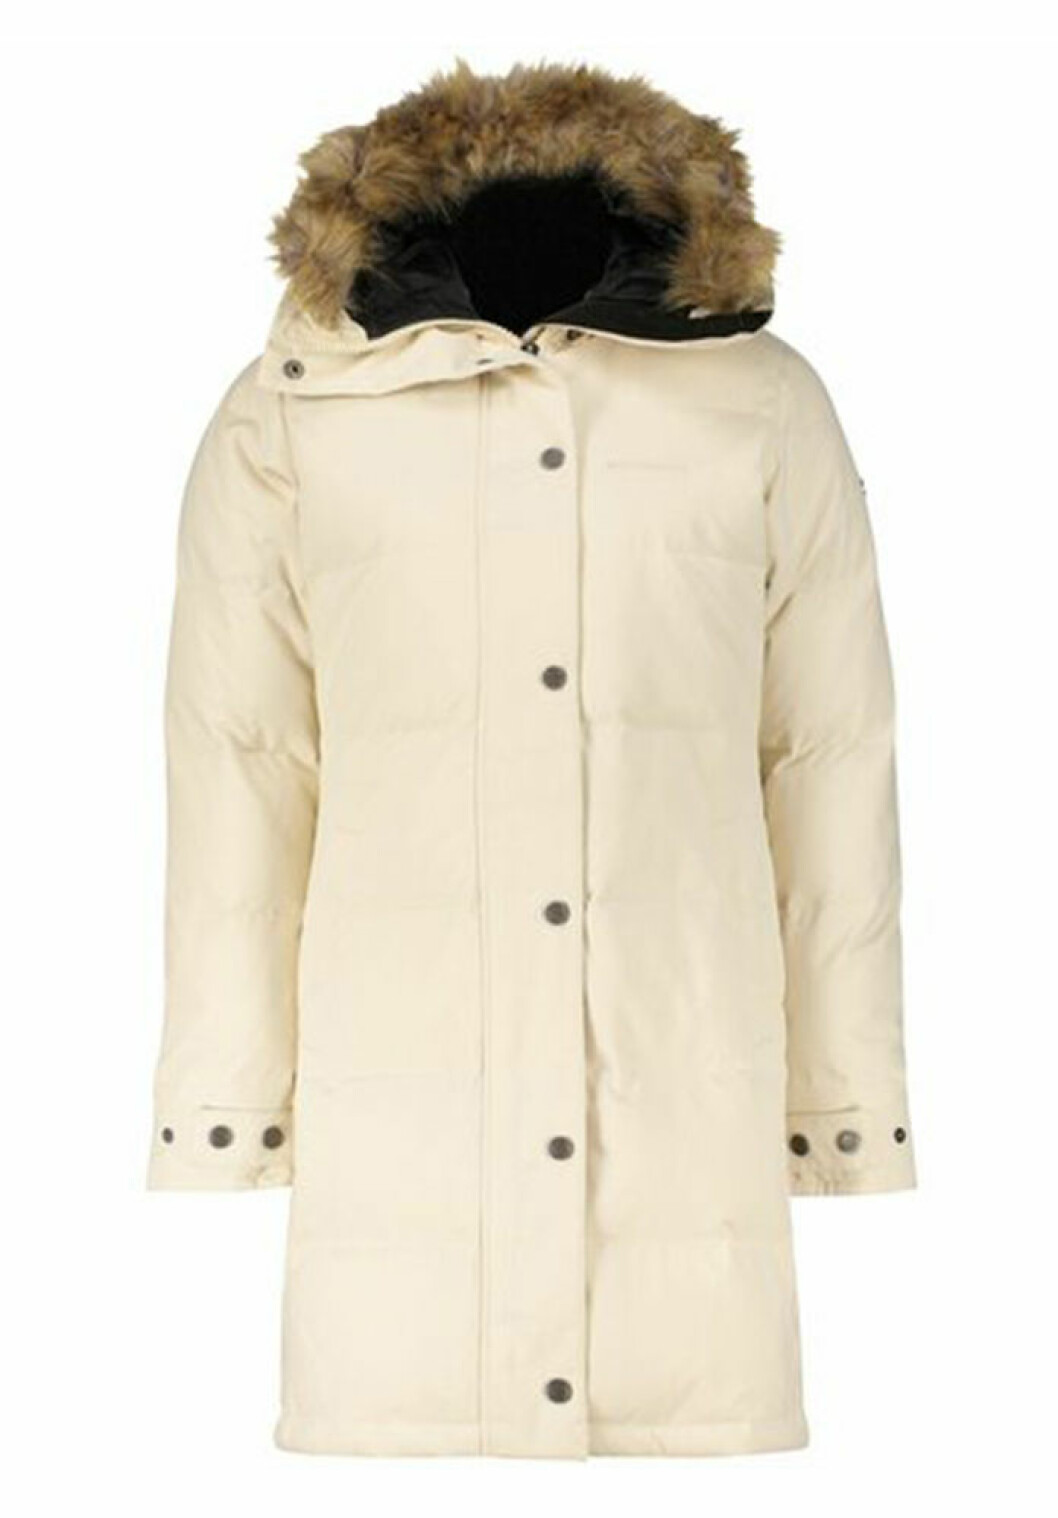 vit-dunjacka-norrsken-jackets